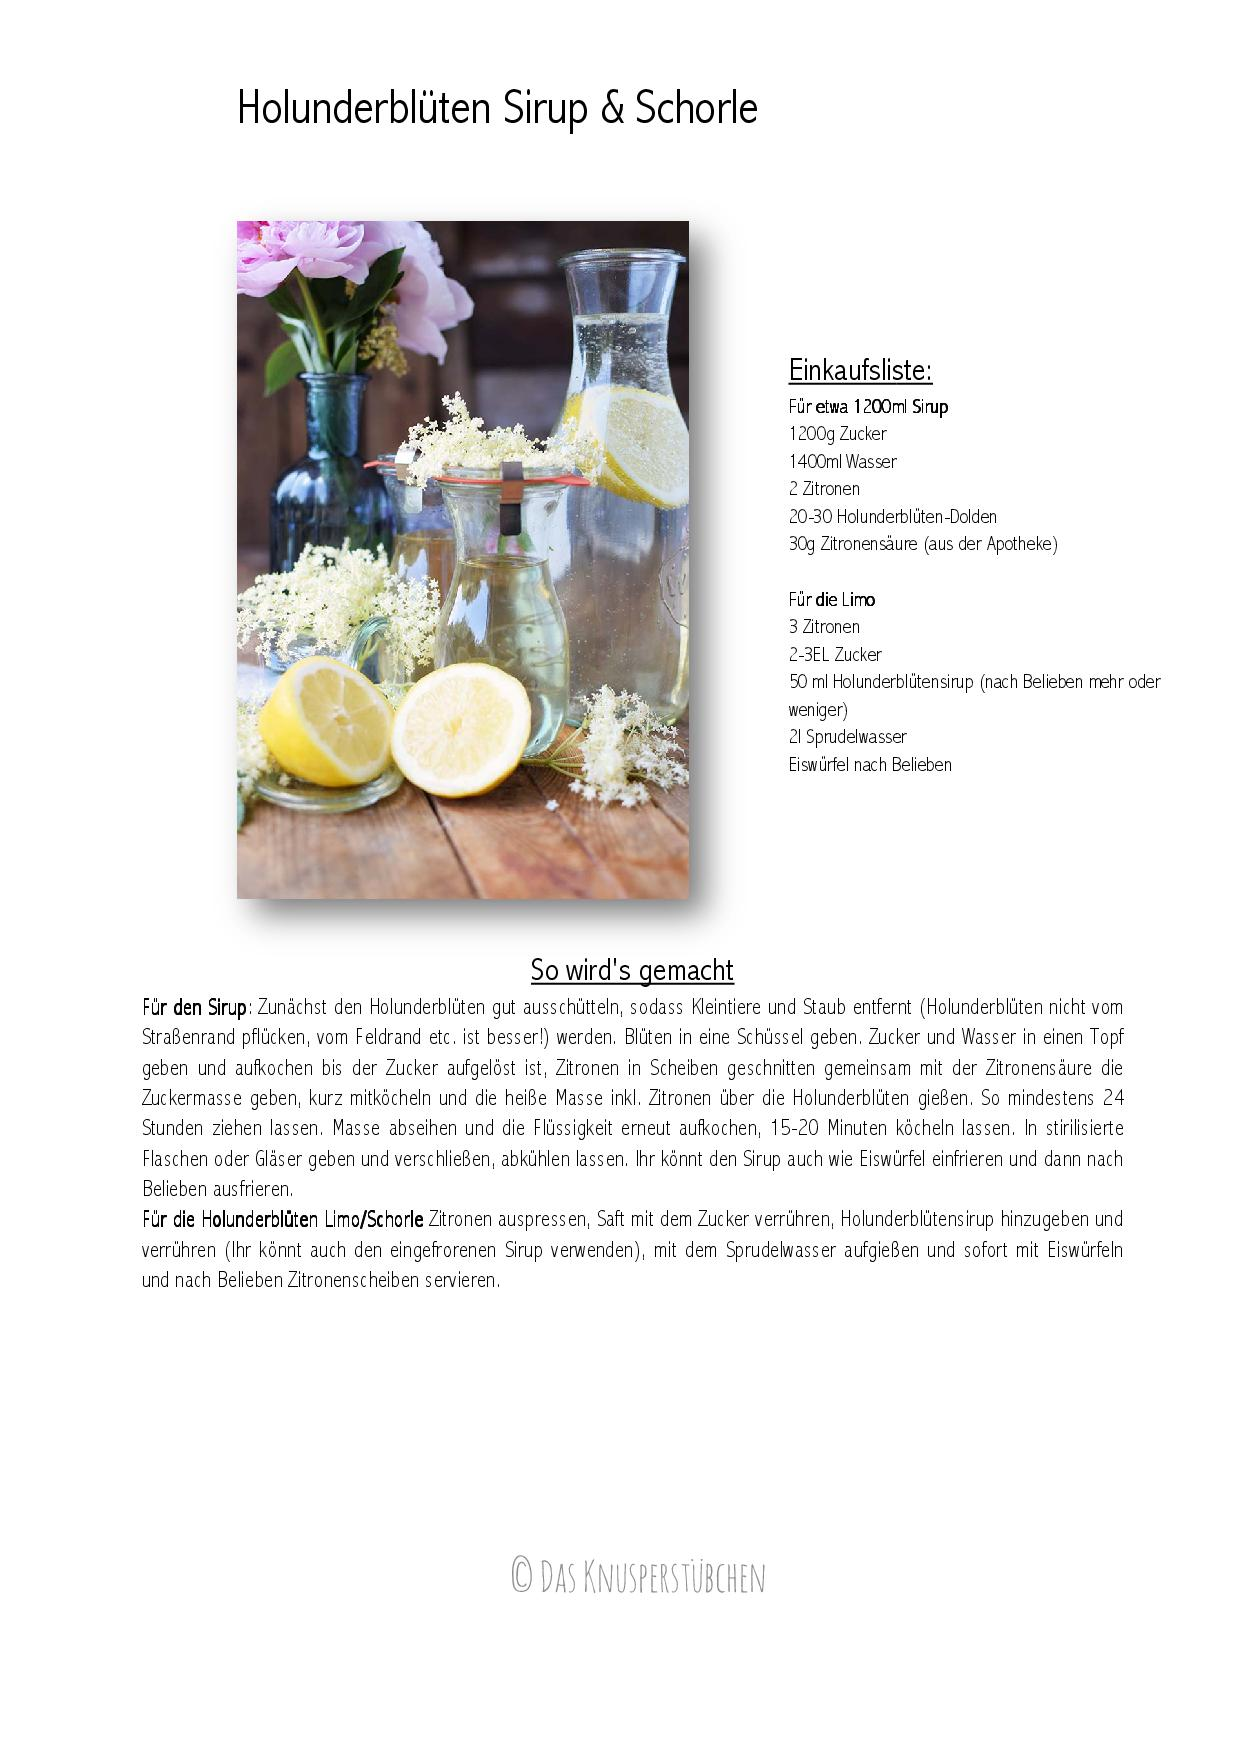 Holunderblueten Sirup & Schorle - Elderflower Cordial & Lemonoade-001